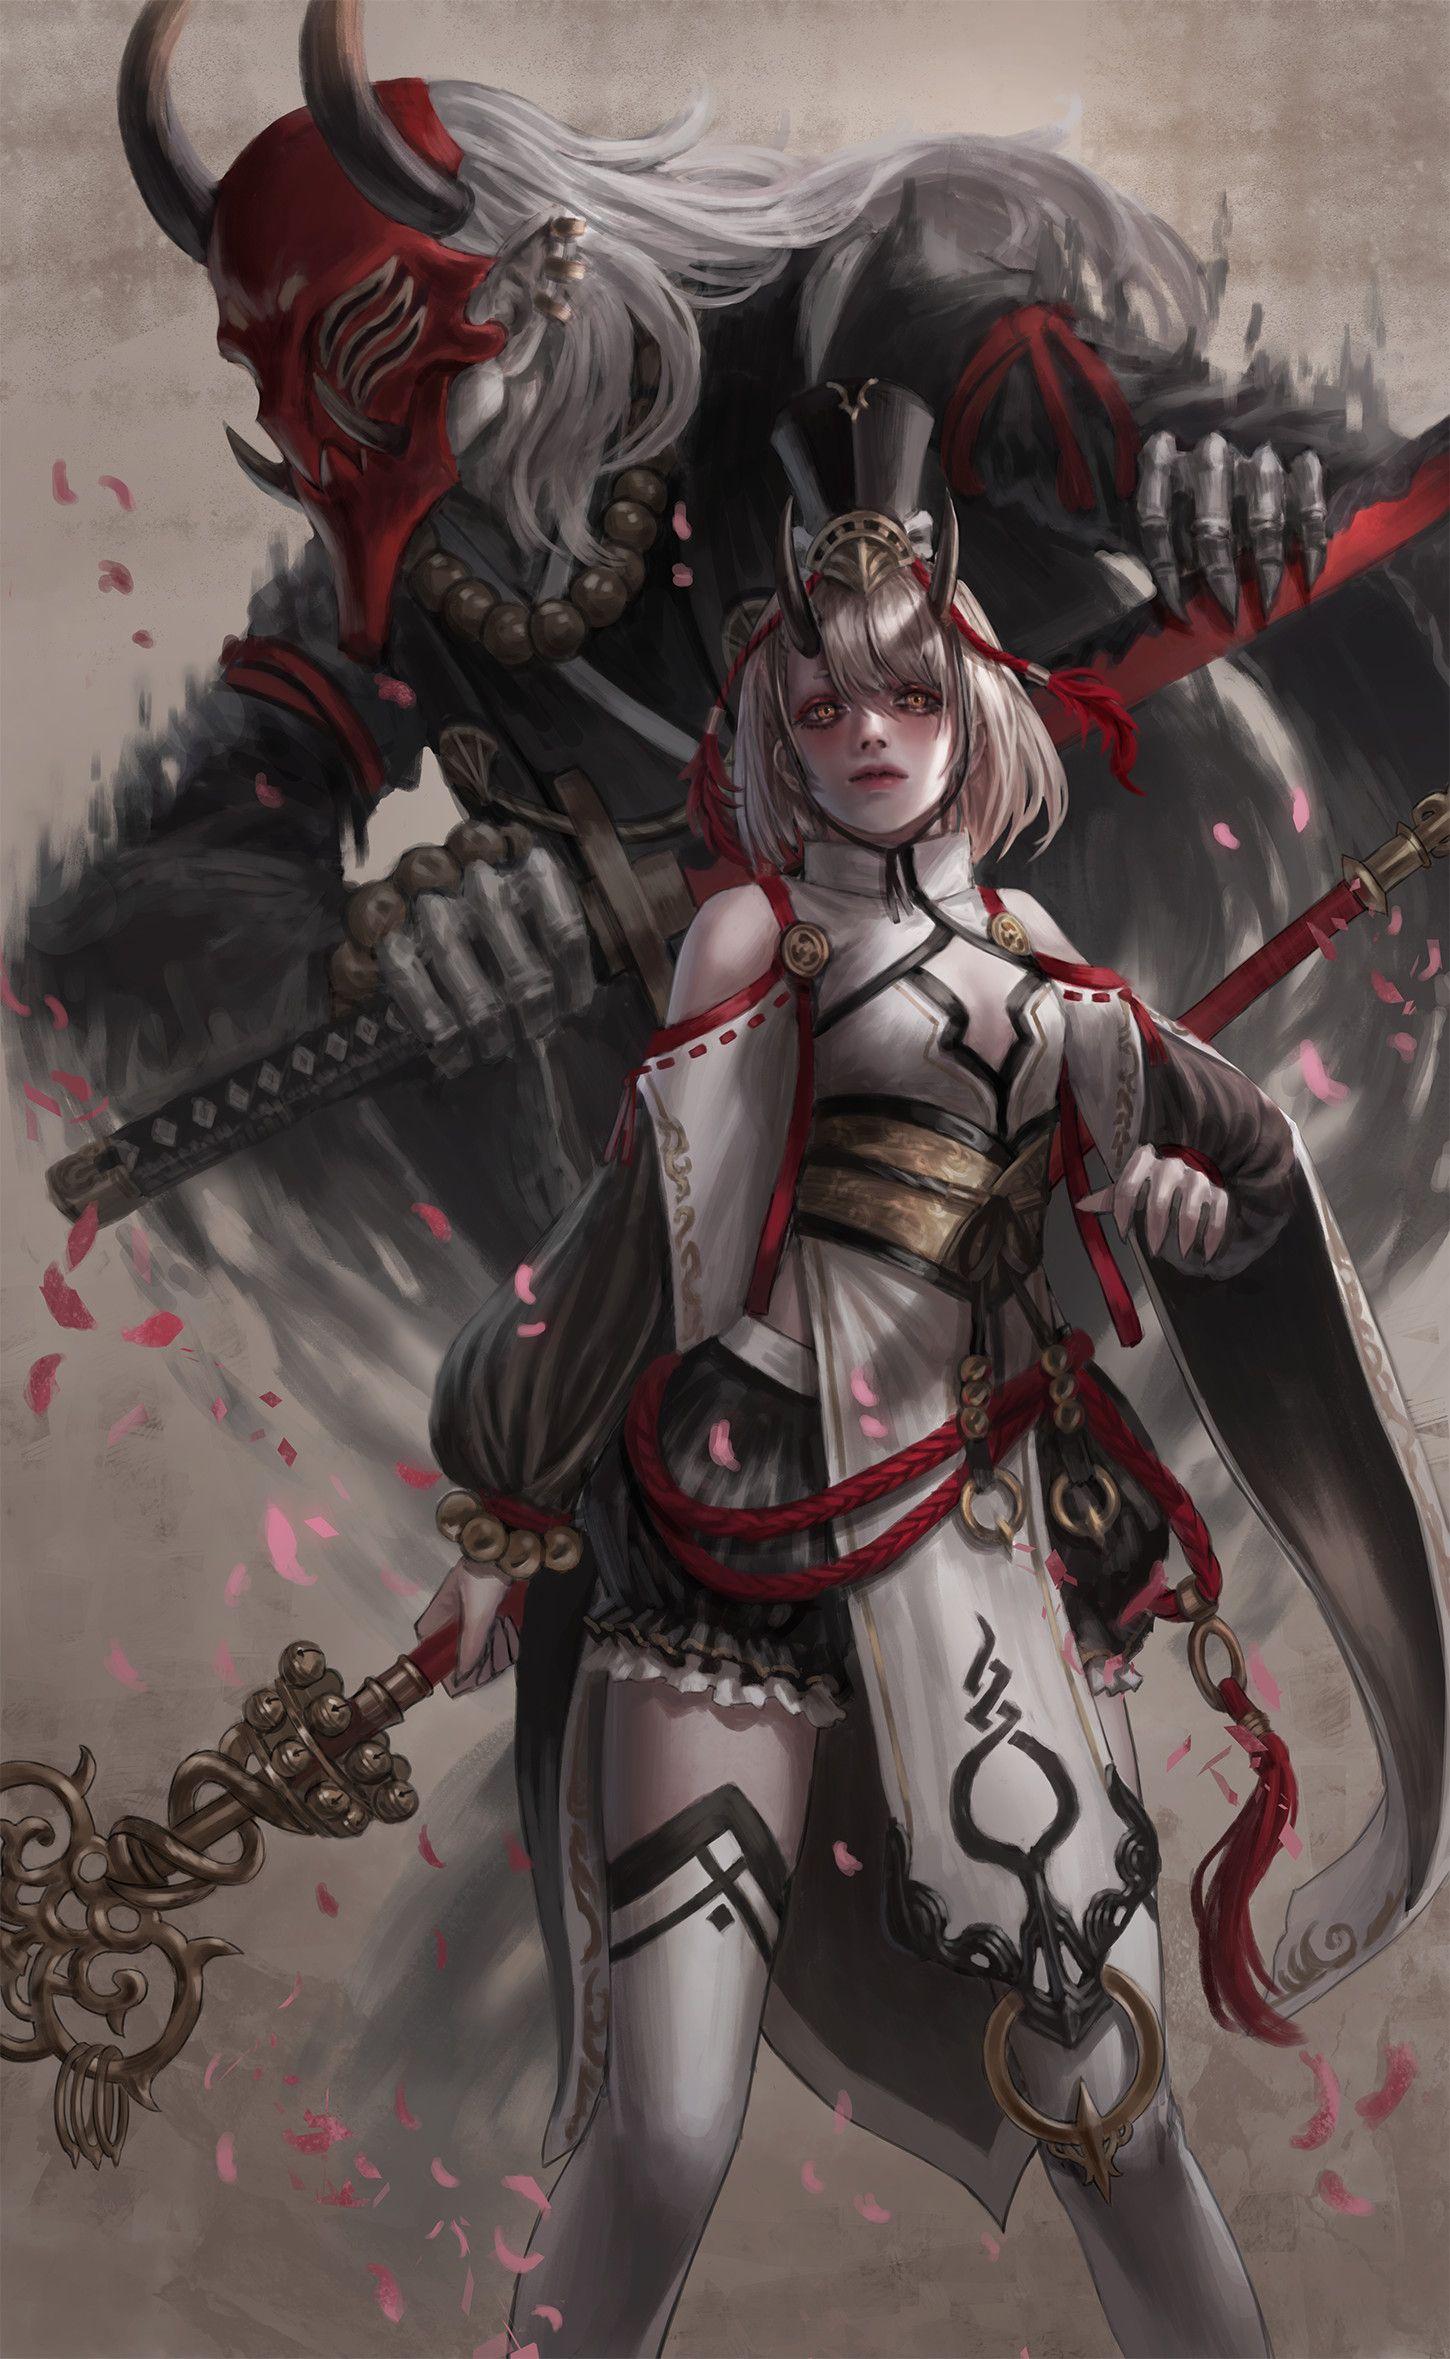 ArtStation Oni Shaman, Gold can Oni, Oni mask, Samurai